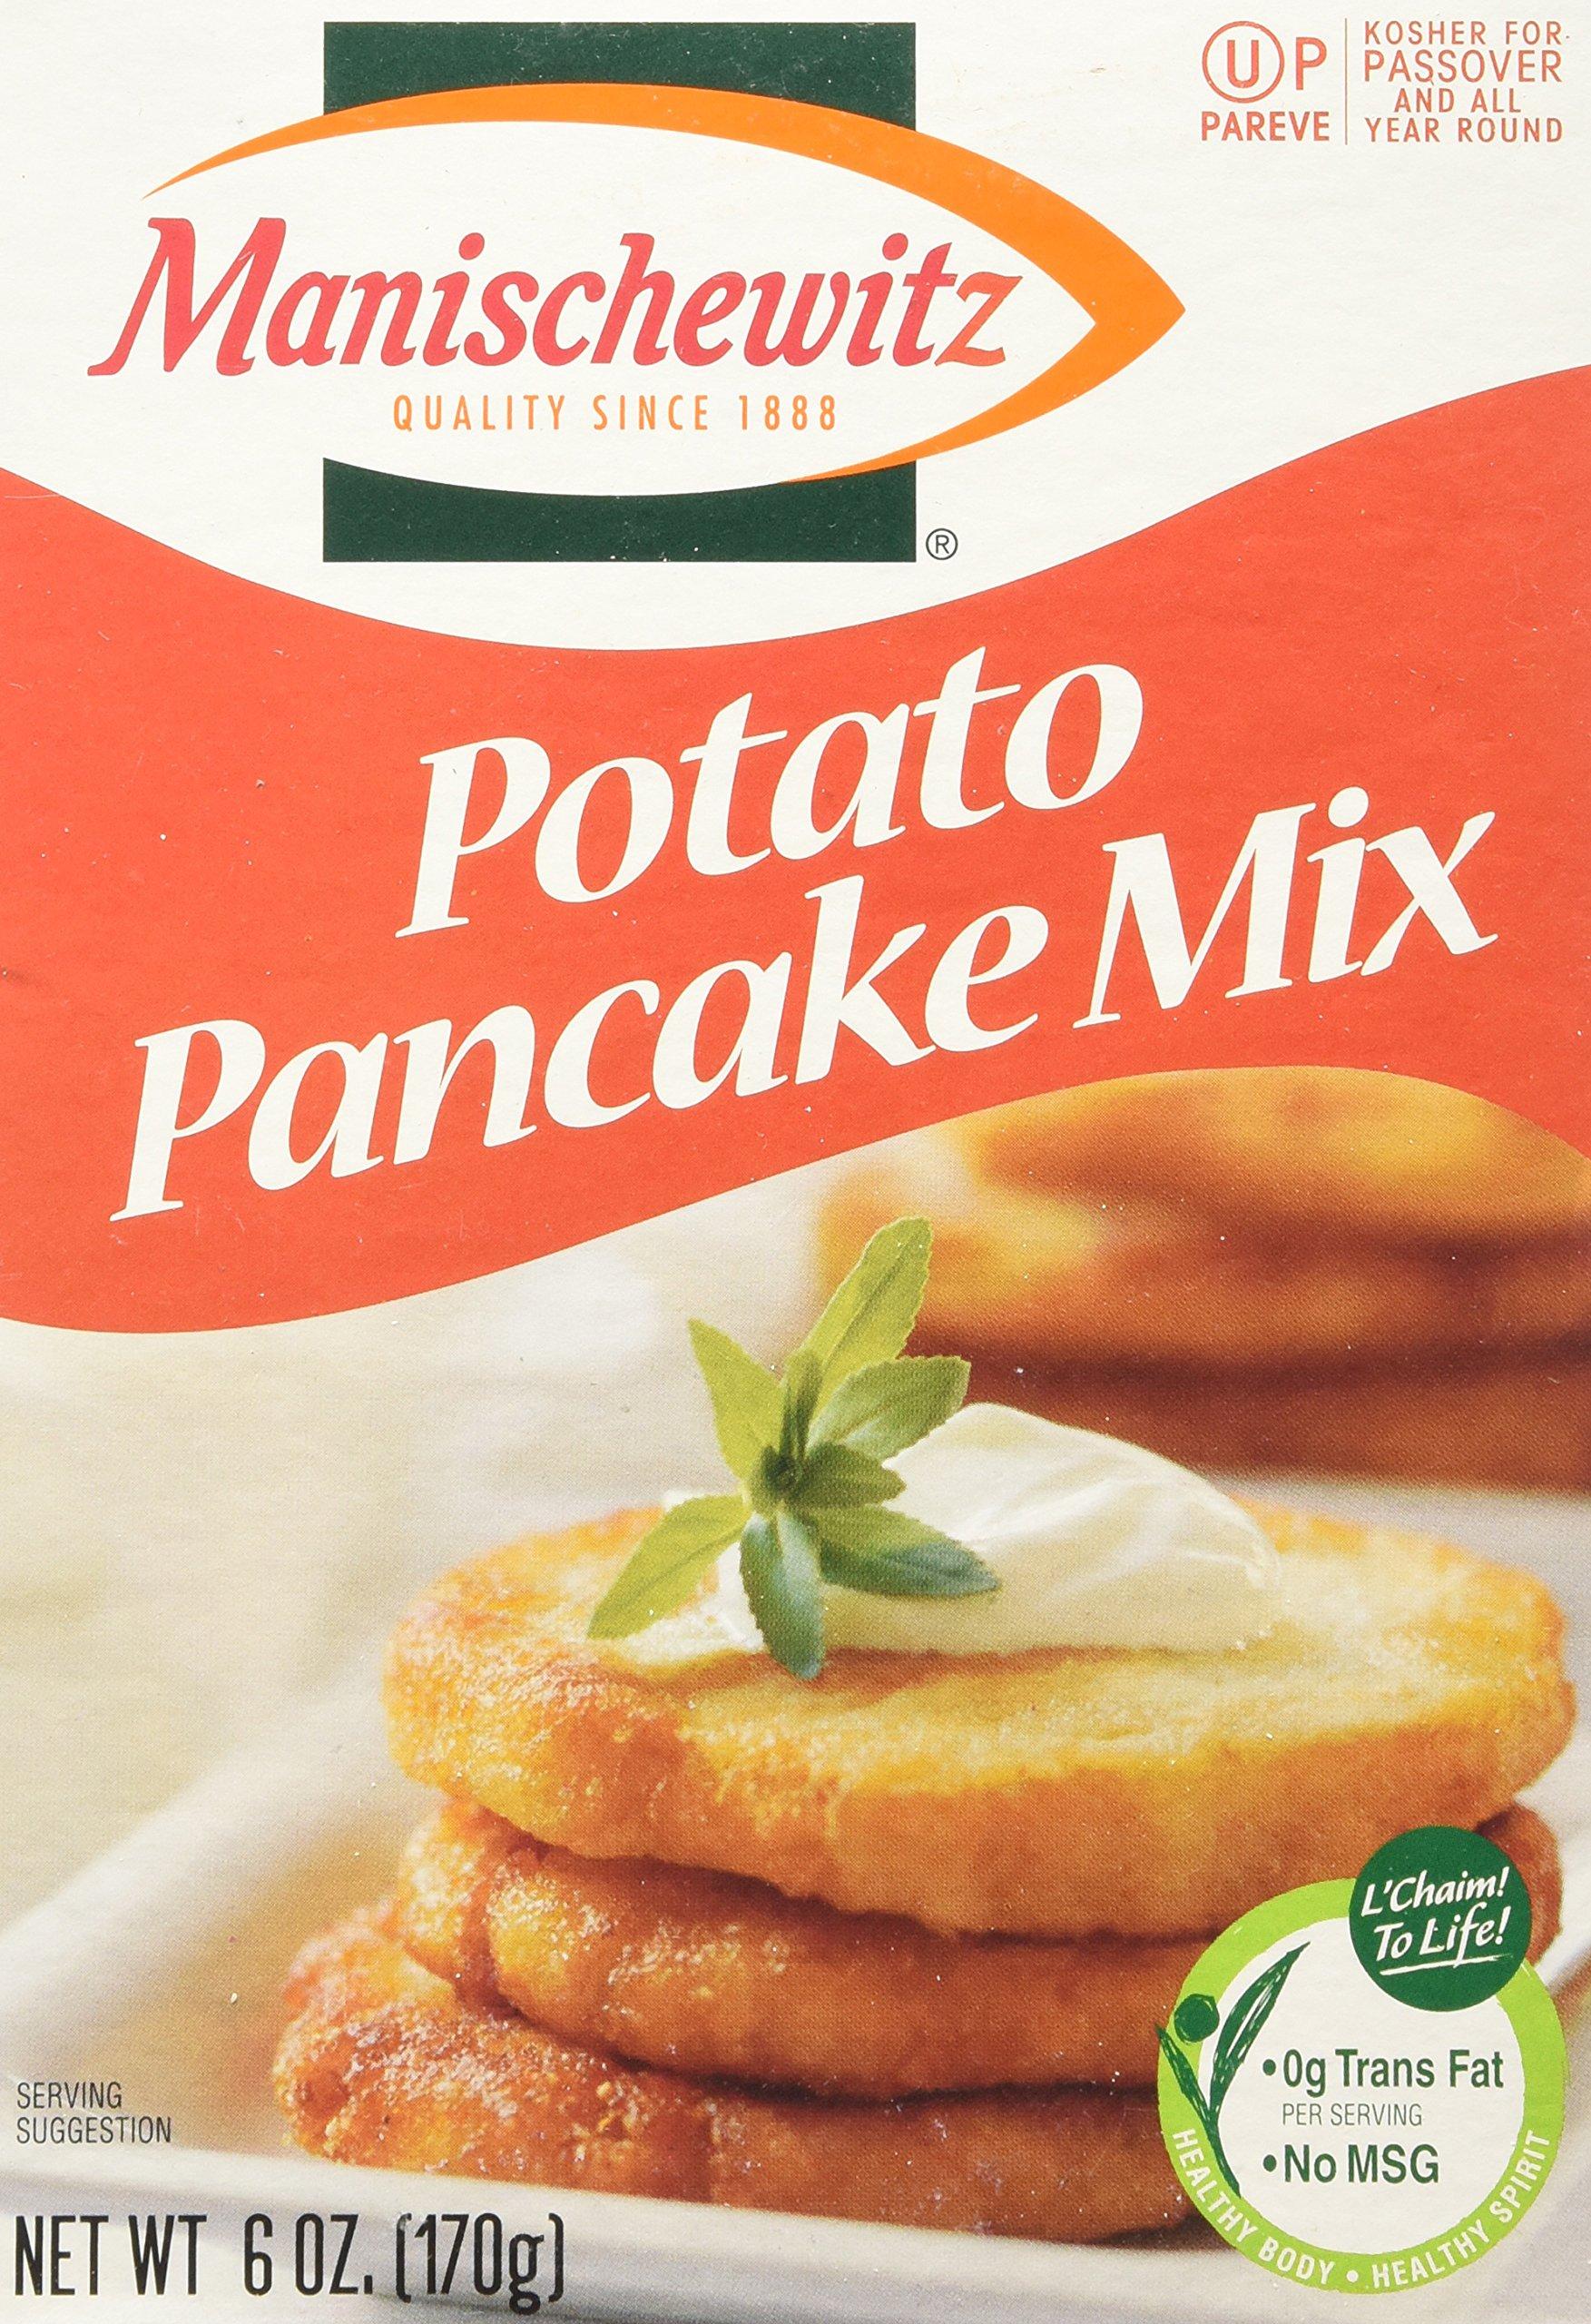 MANISCHEWITZ Potato Pancake Mix, 6-Ounce Boxes (Pack of 6)